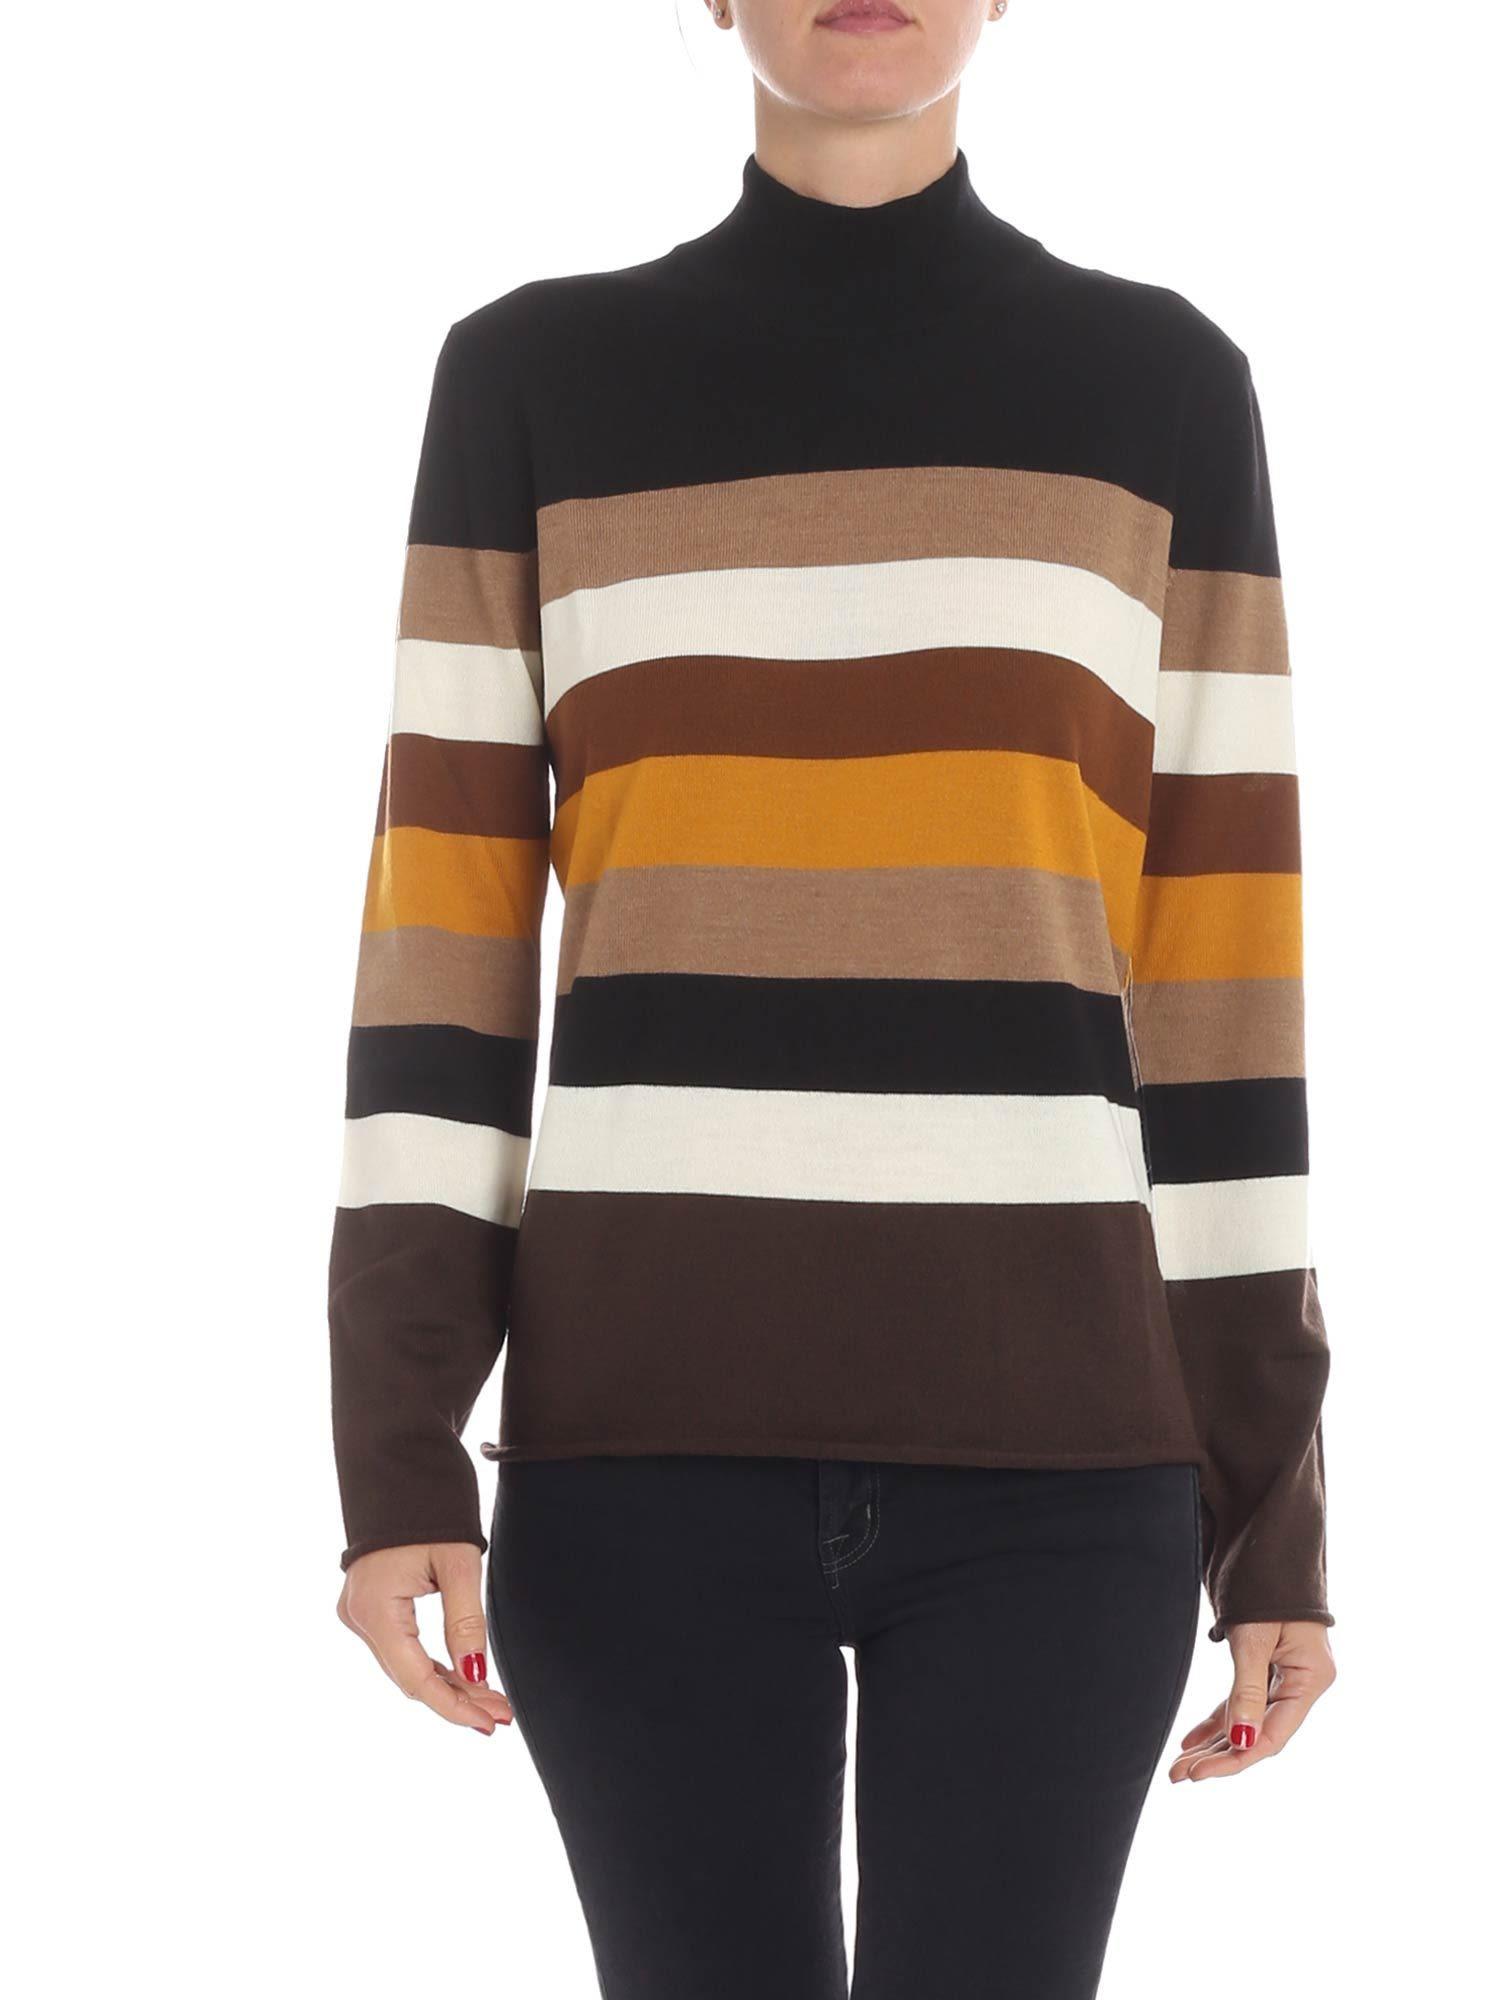 ALTEA Stripe Knit Pullover in Black